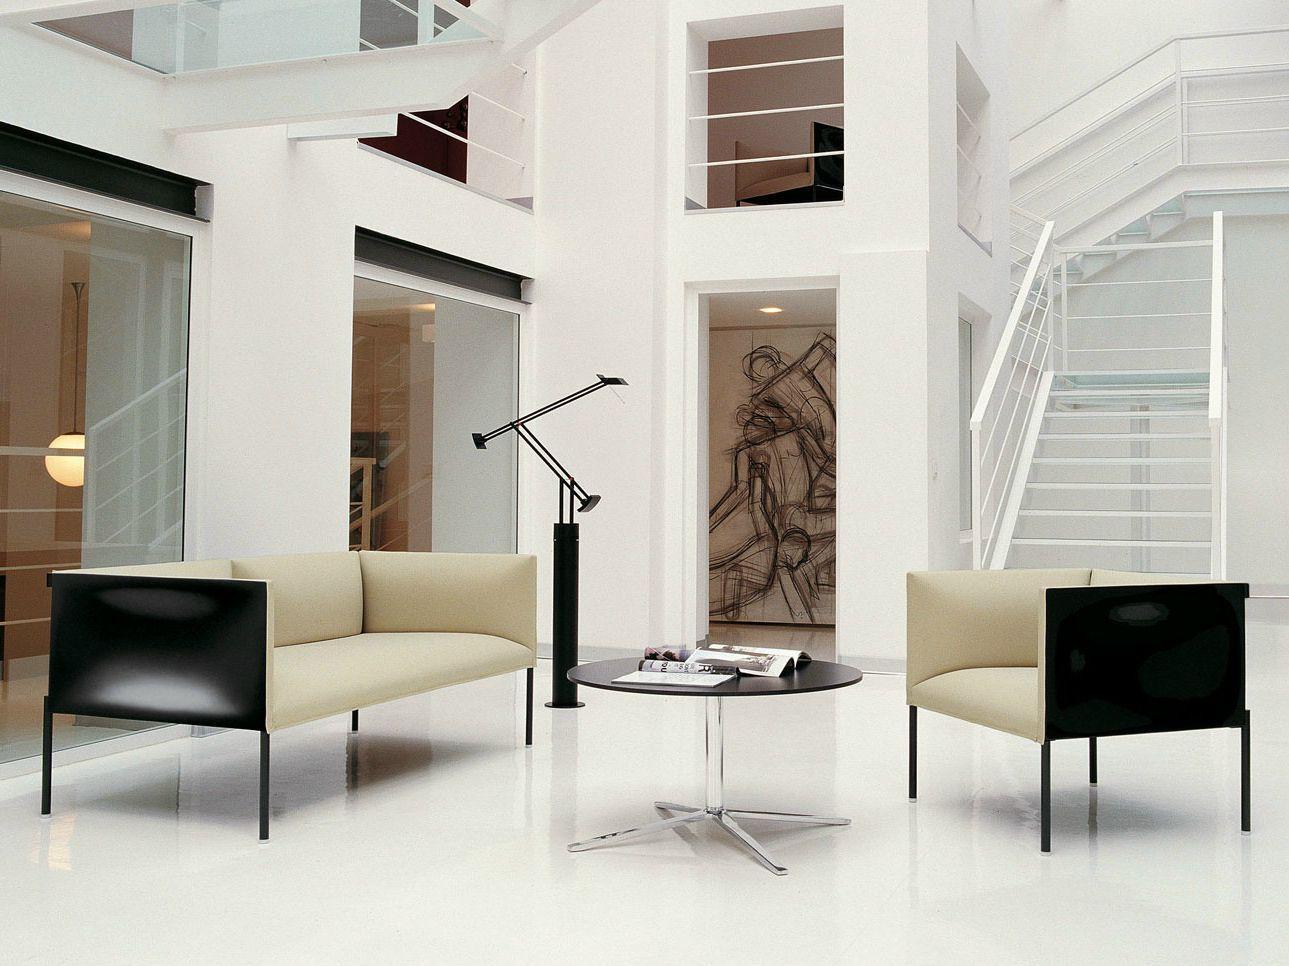 Hollow armchair by b b italia project a brand of b b for B b italia spa